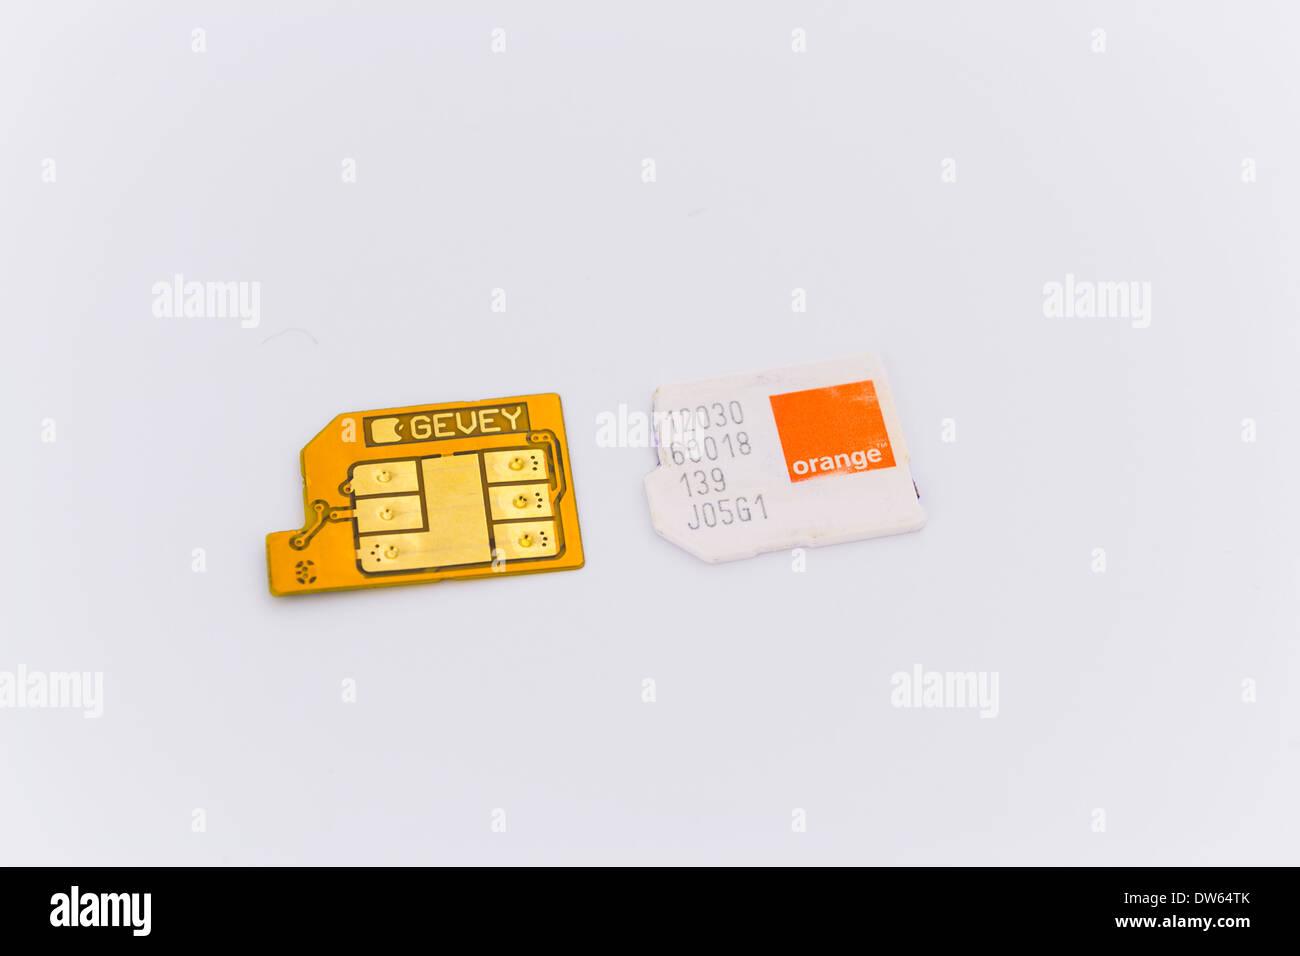 Gevey Ultra S unlock solution for iPhone smartphones and Orange microSIM - Stock Image